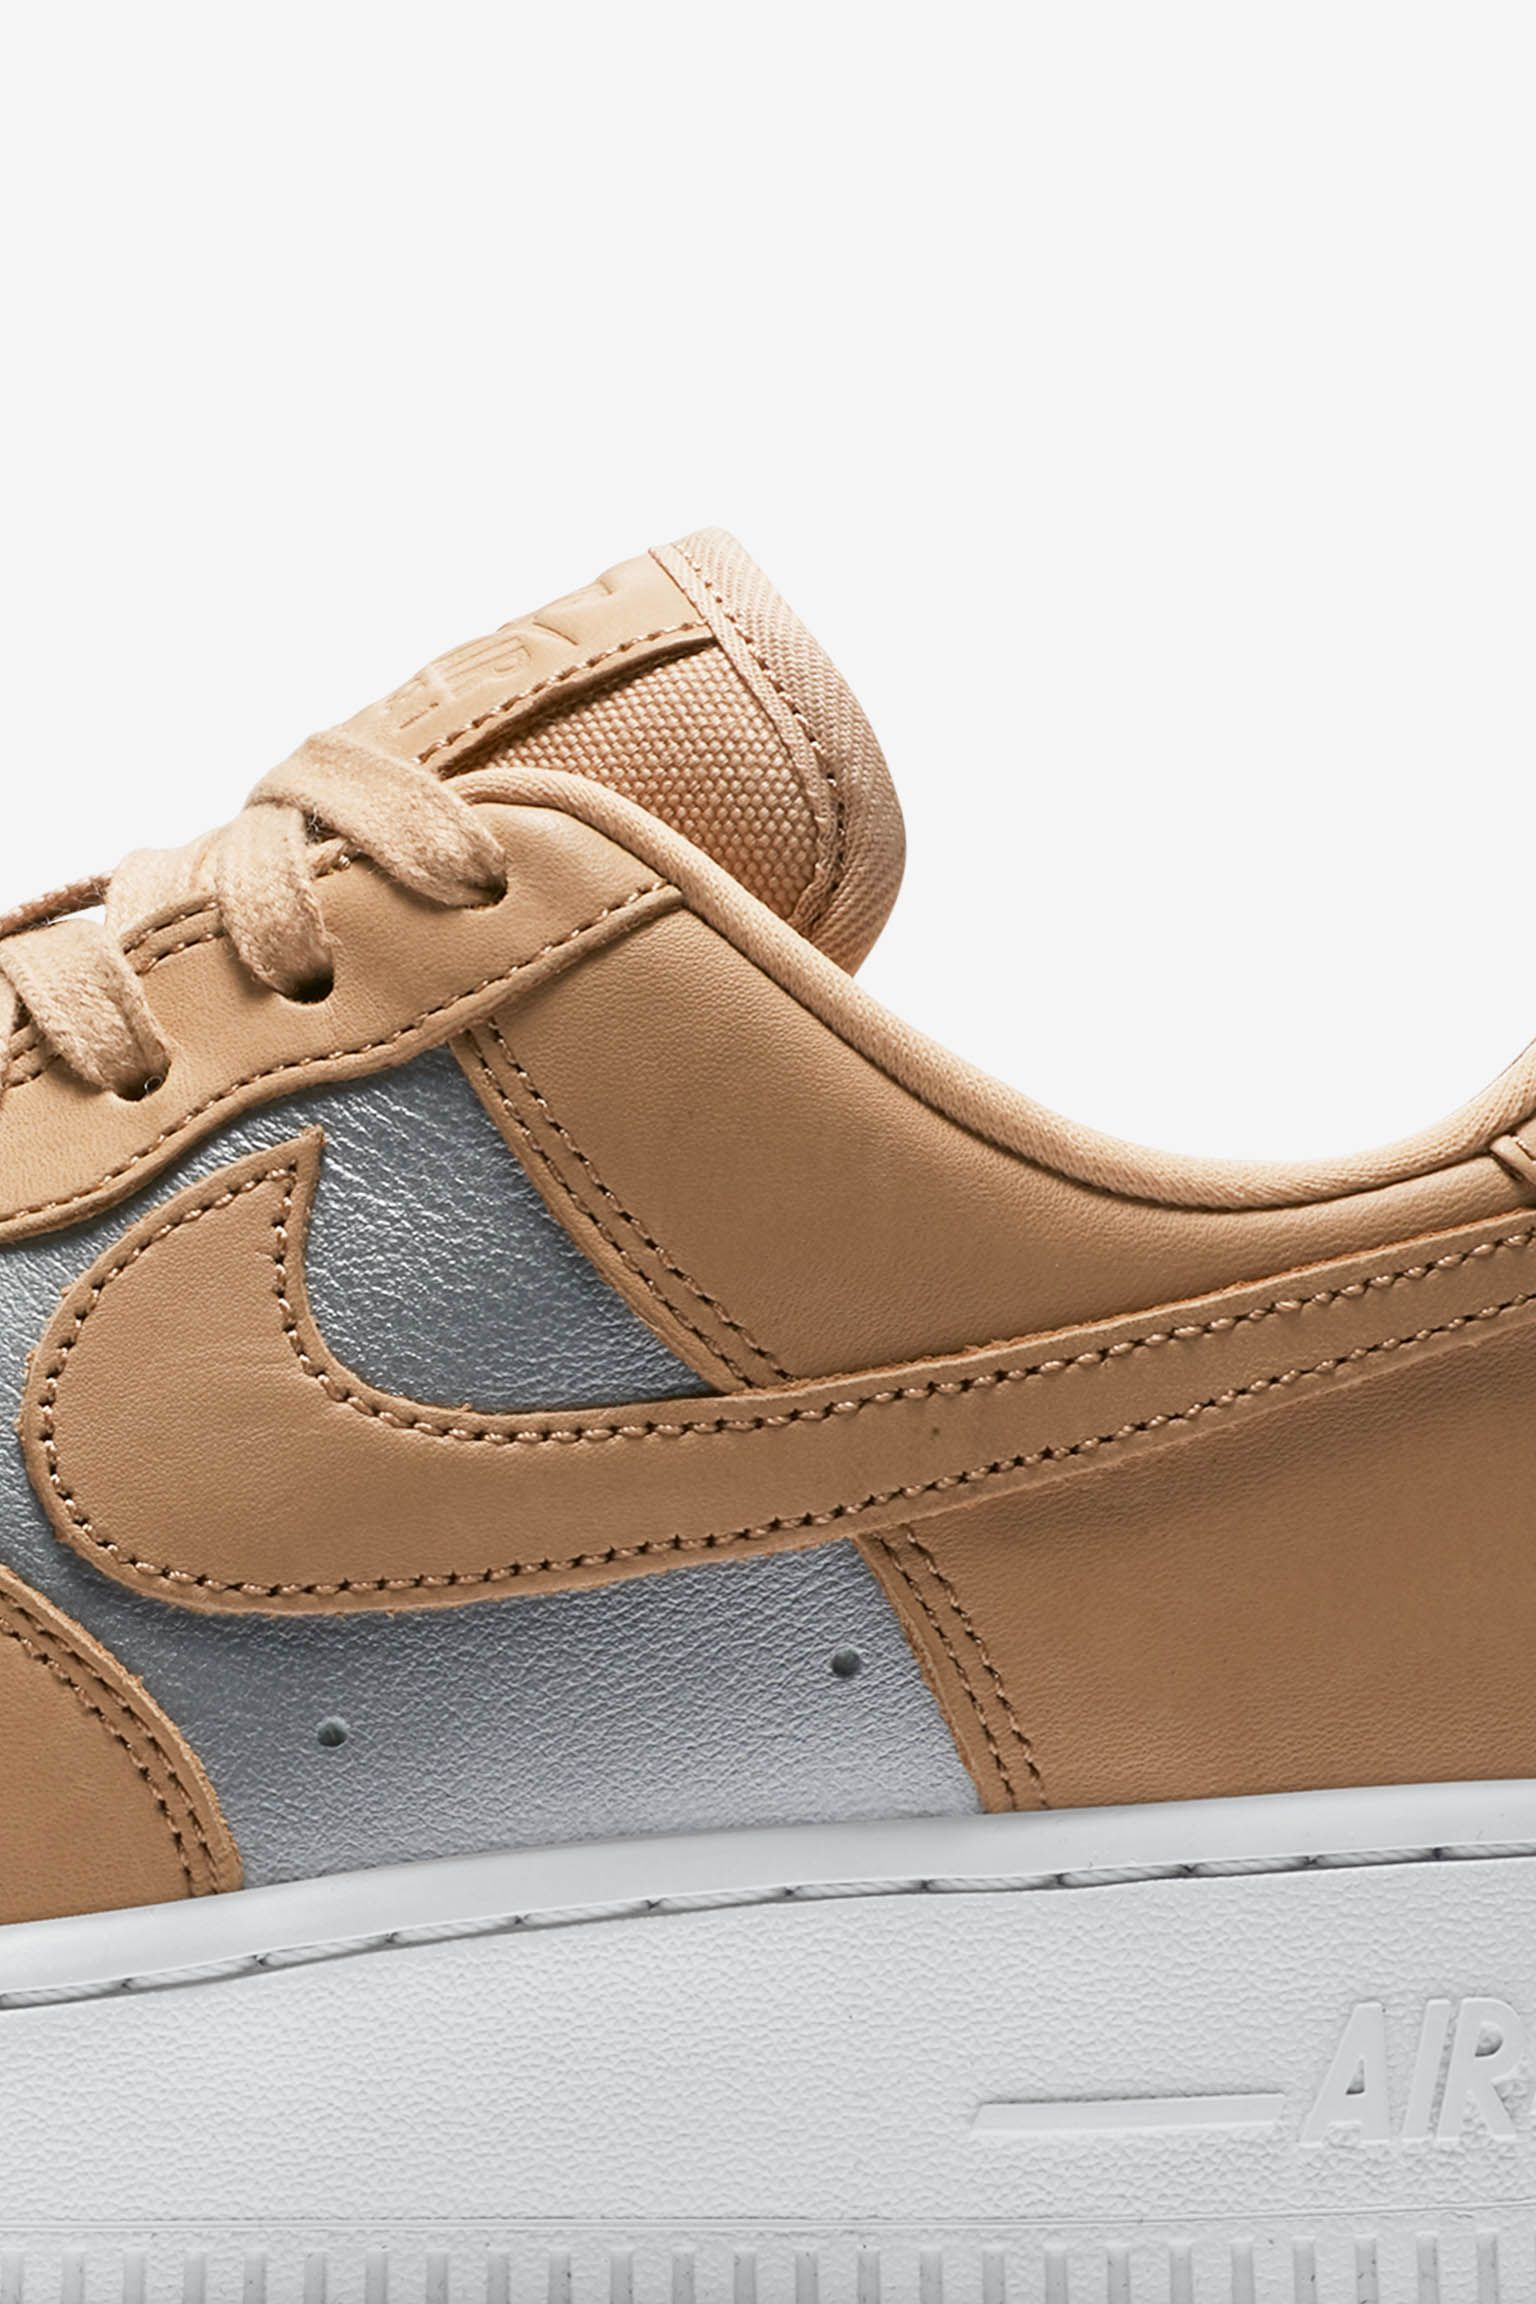 Nike Women s Air Force 1  Bio Beige   Metallic Silver  Release Date ... 9c5c55daf4